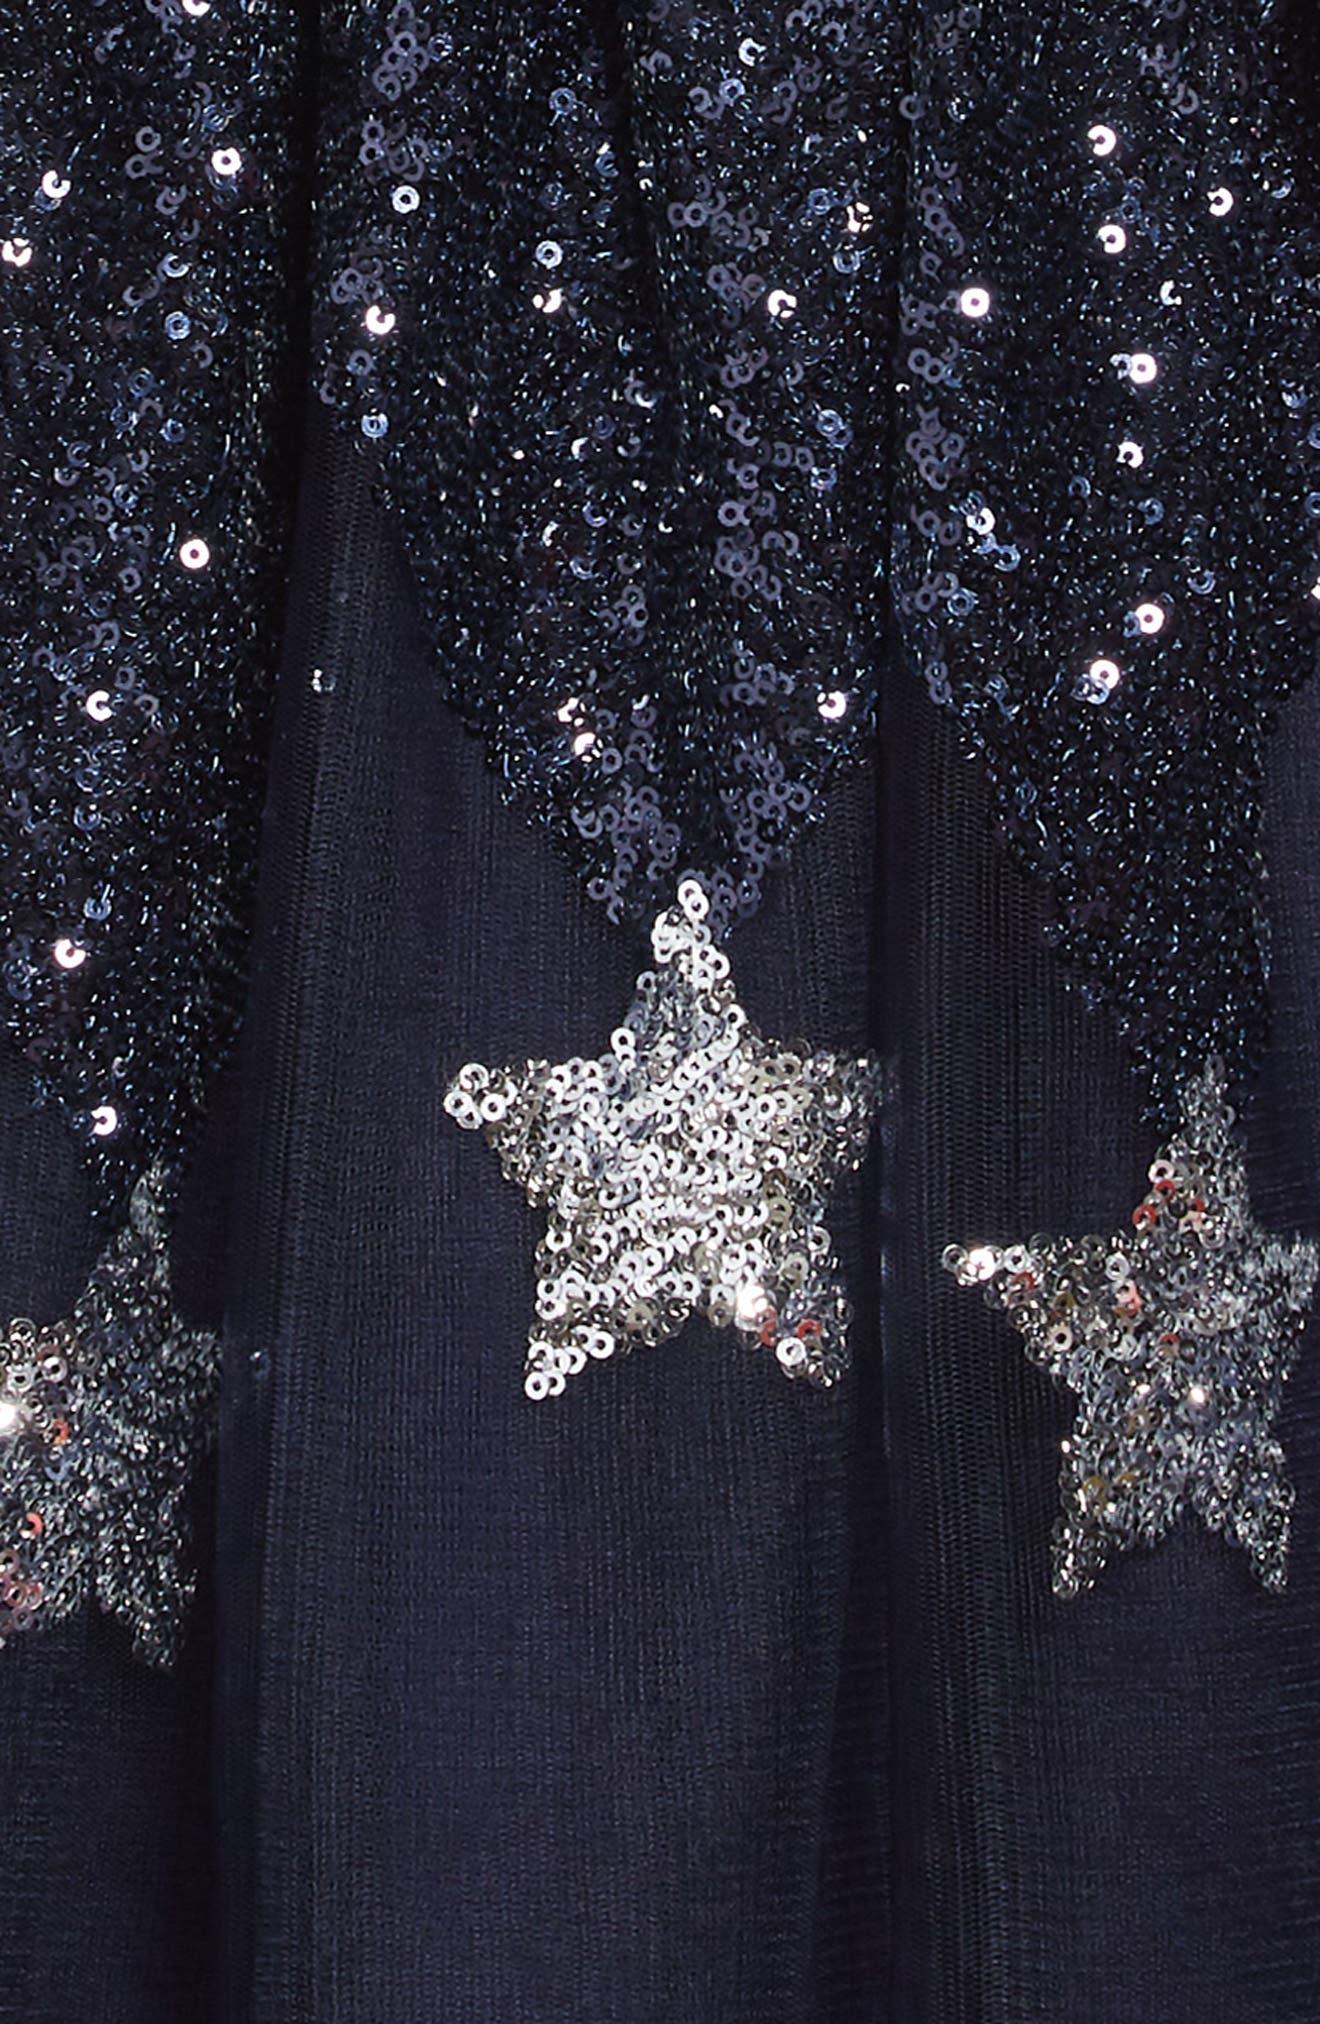 Star Sequin Tulle Dress,                             Alternate thumbnail 3, color,                             NAVY